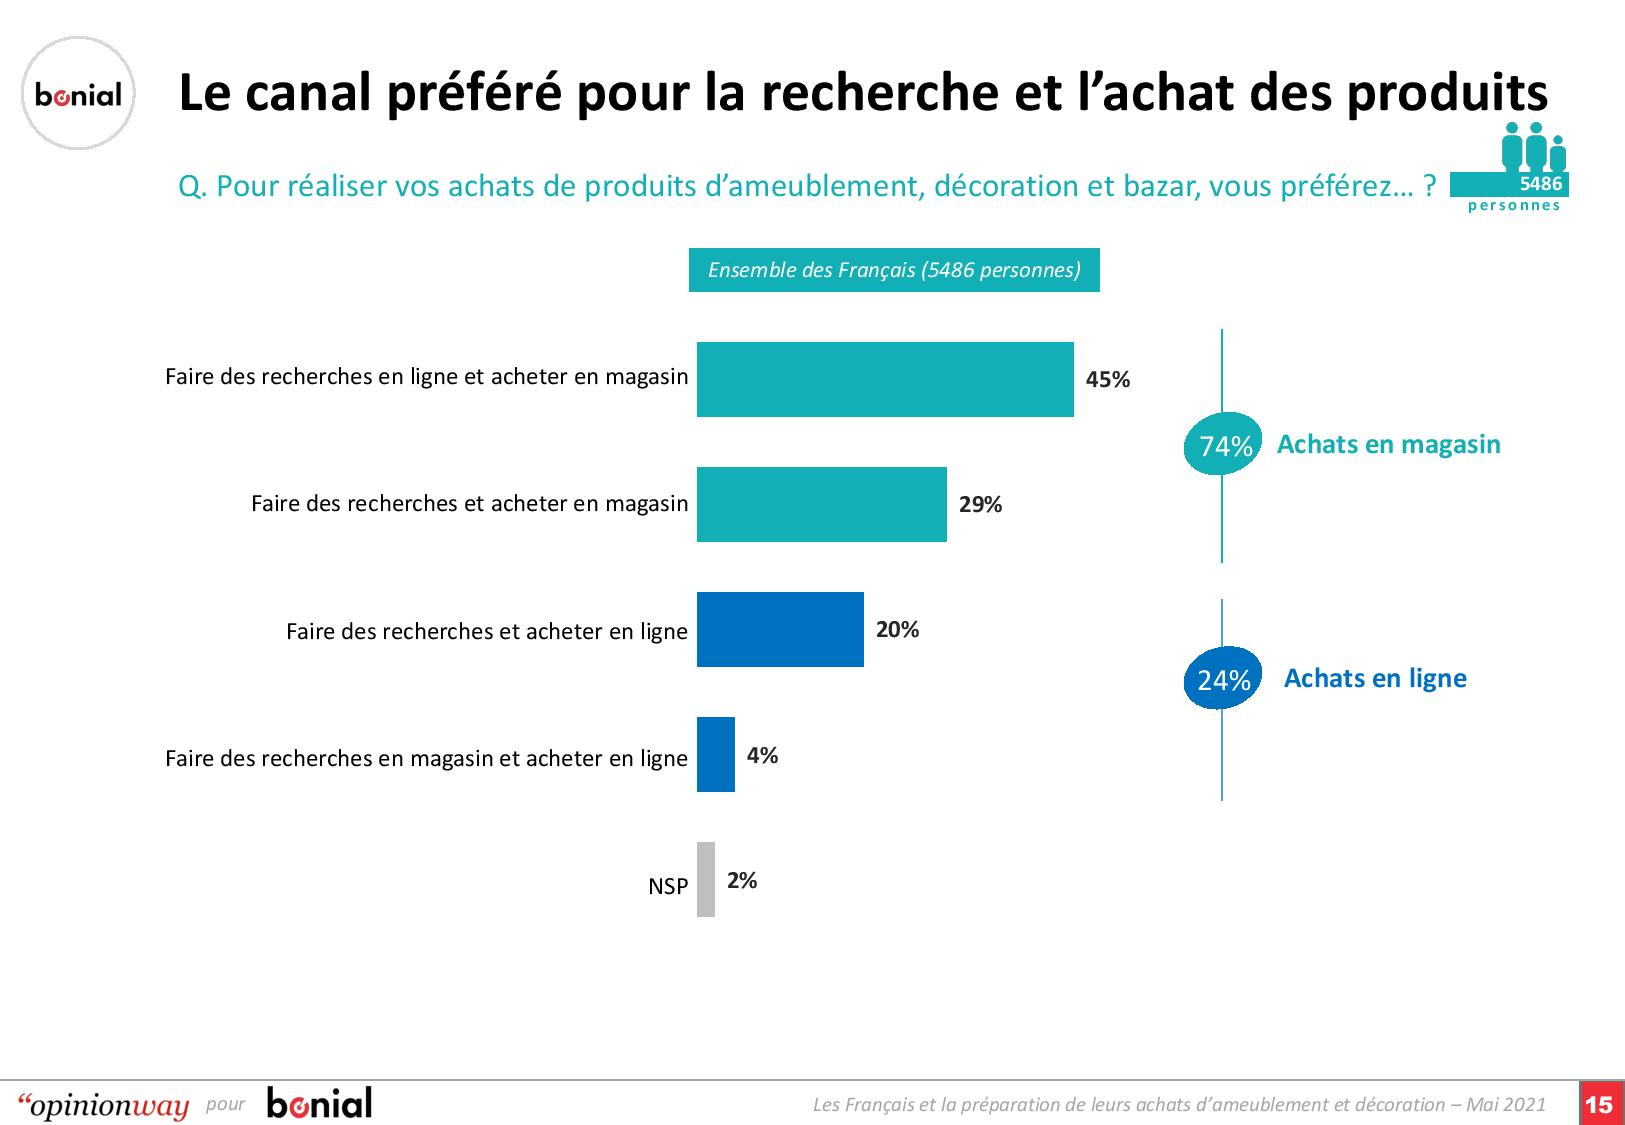 Survey-Ameublement-Decoration-Bonial-Mai-2021 (dragged) 2-page-001